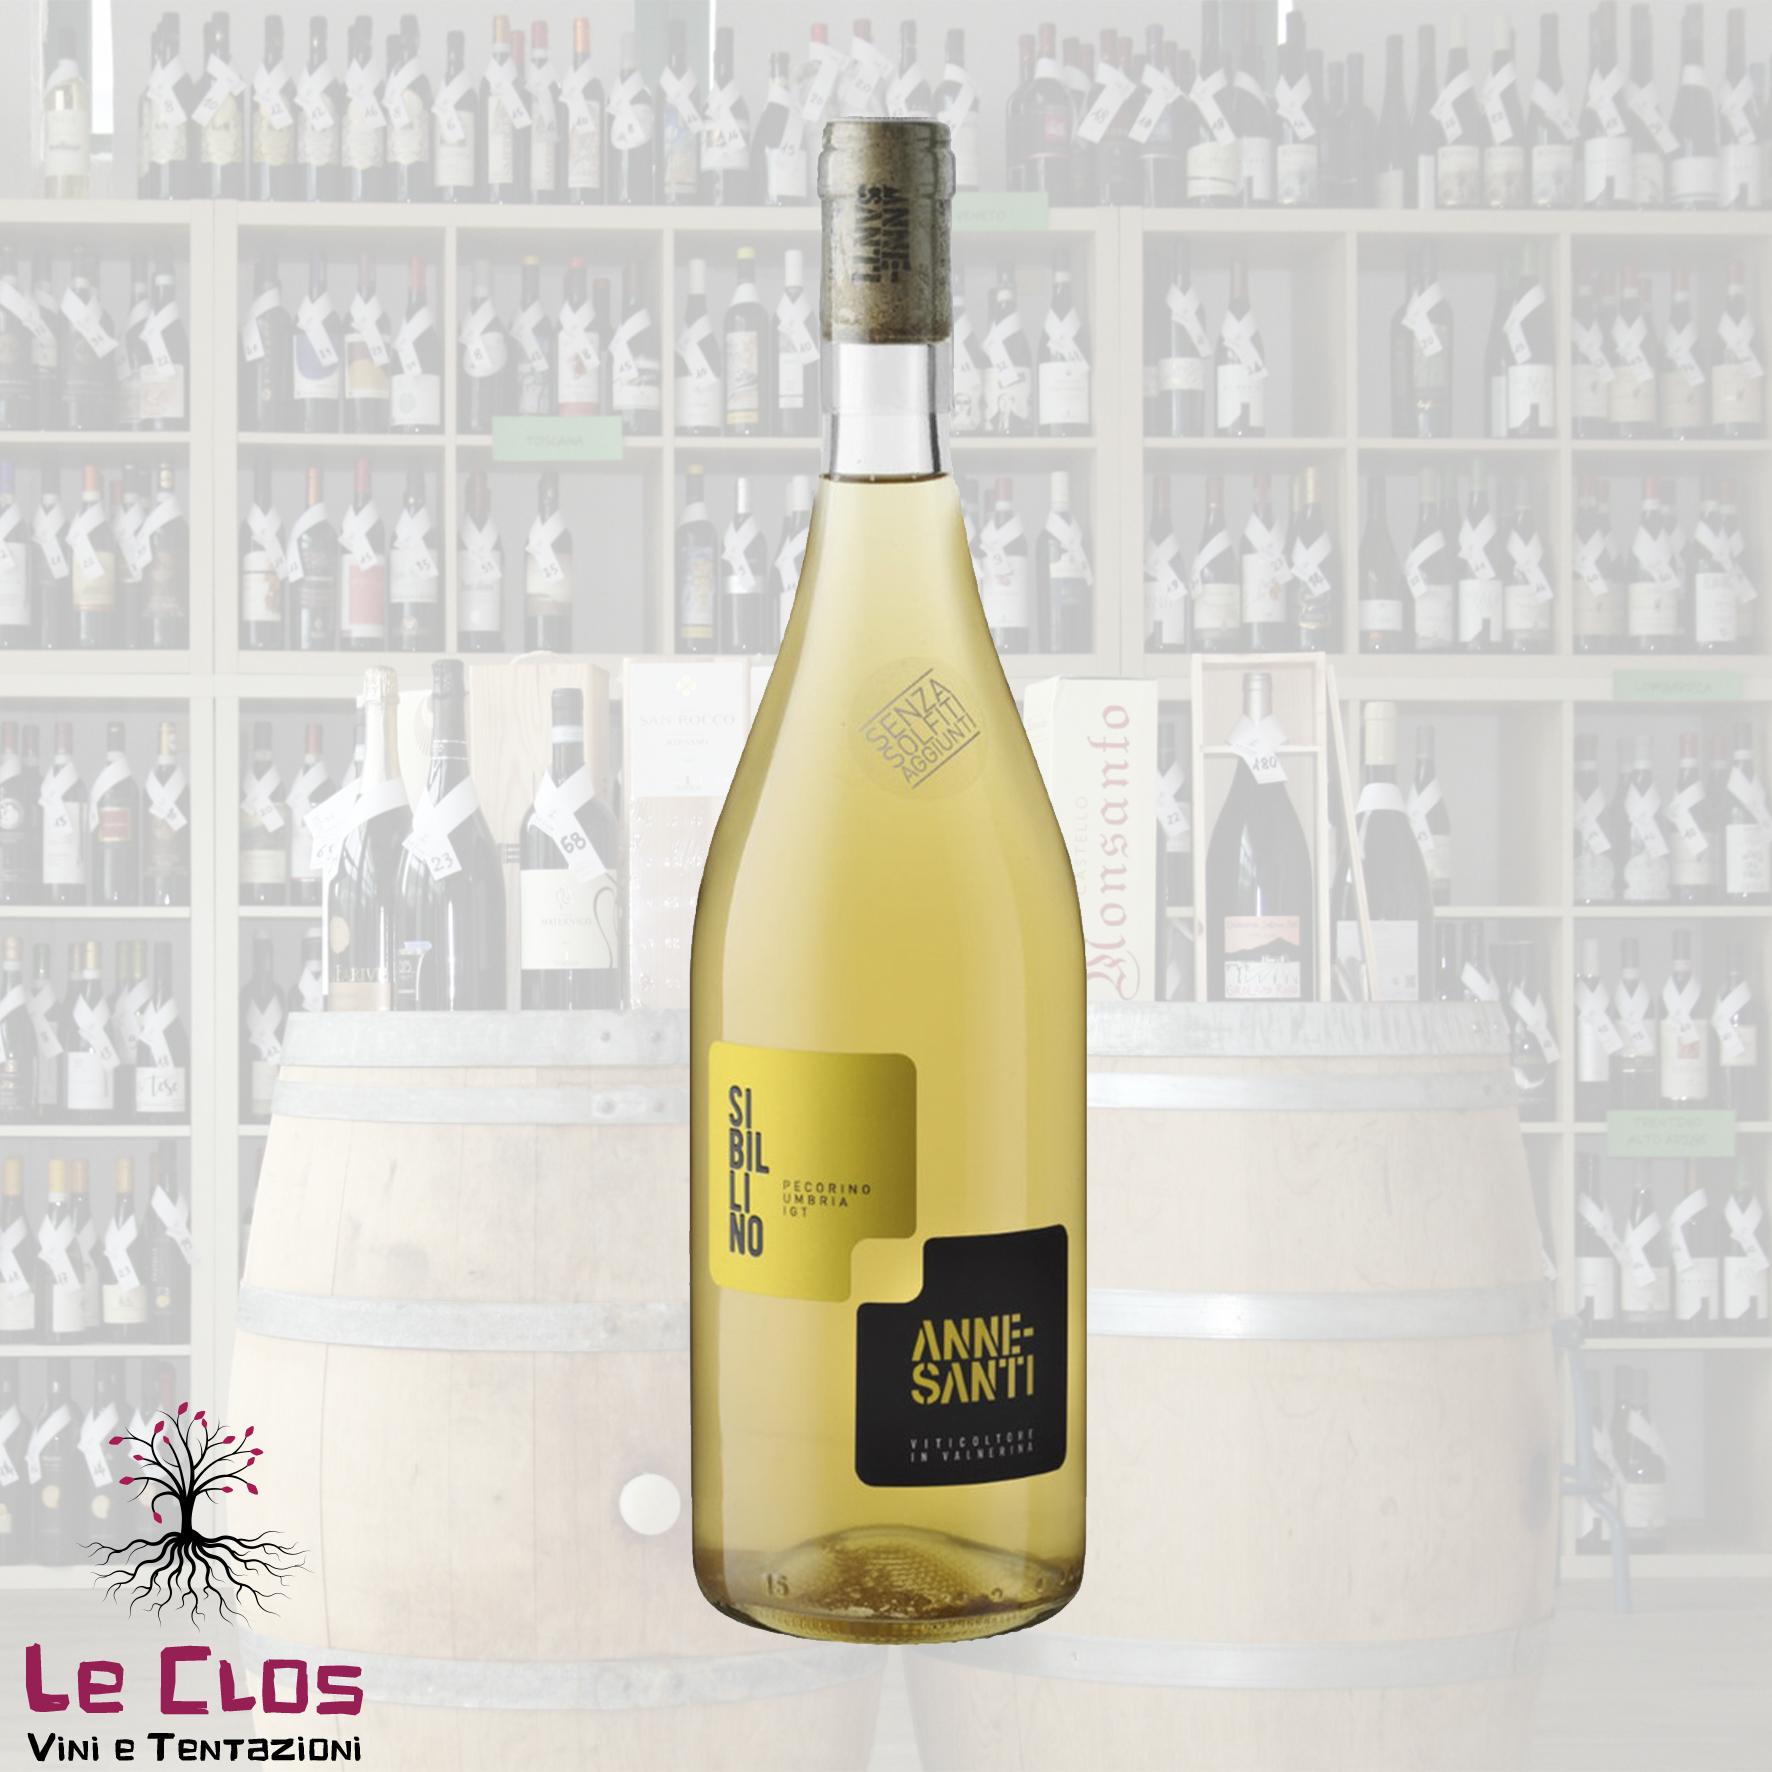 Vino bianco Sibillino